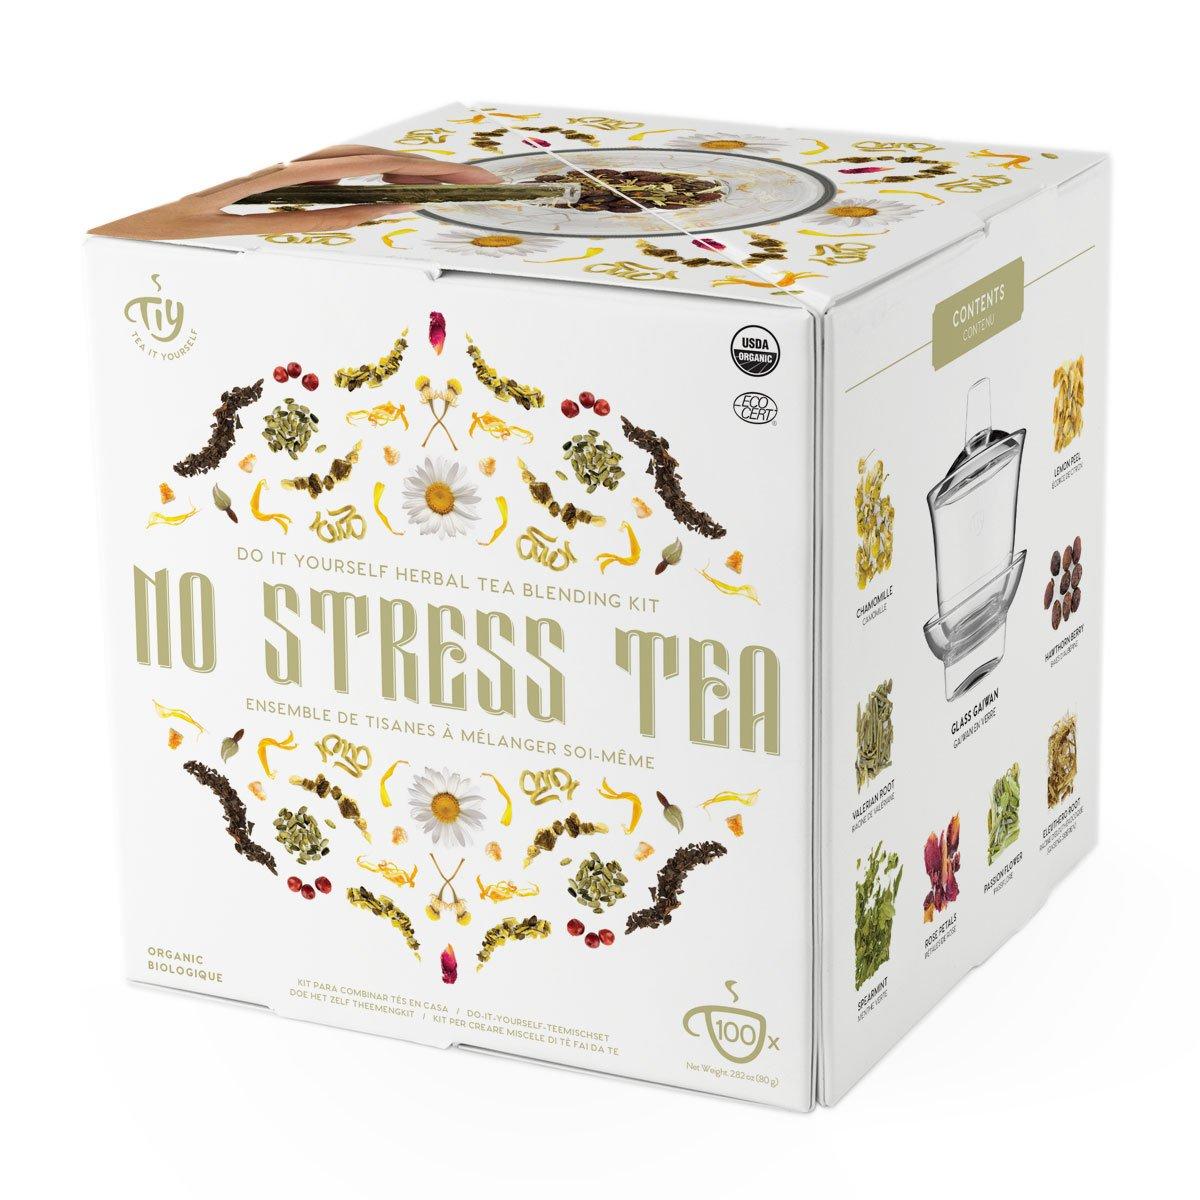 Amazon no stress herbal tea blending kit tea it yourself amazon no stress herbal tea blending kit tea it yourself health personal care solutioingenieria Images